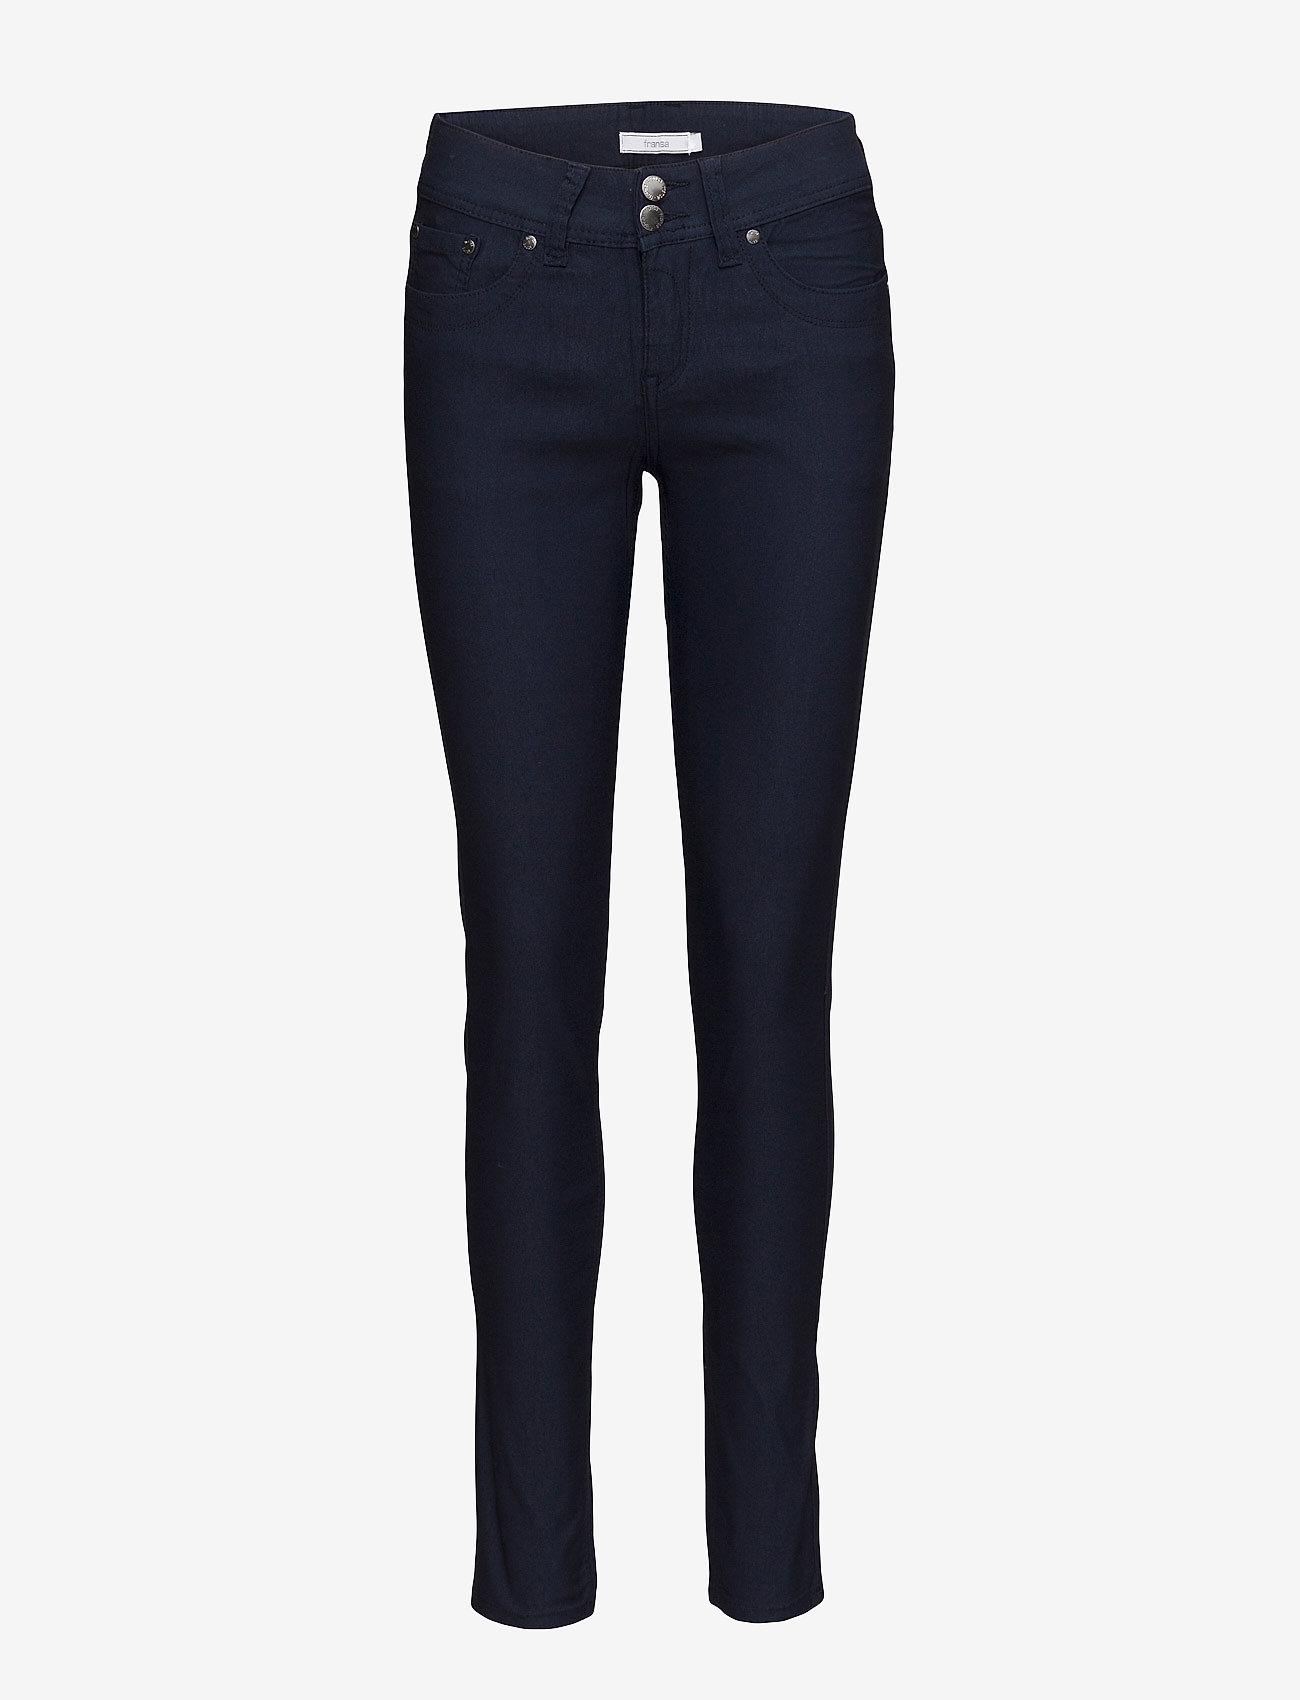 Fransa - Zalin 1 Pant - trousers with skinny legs - dark peacoat - 0